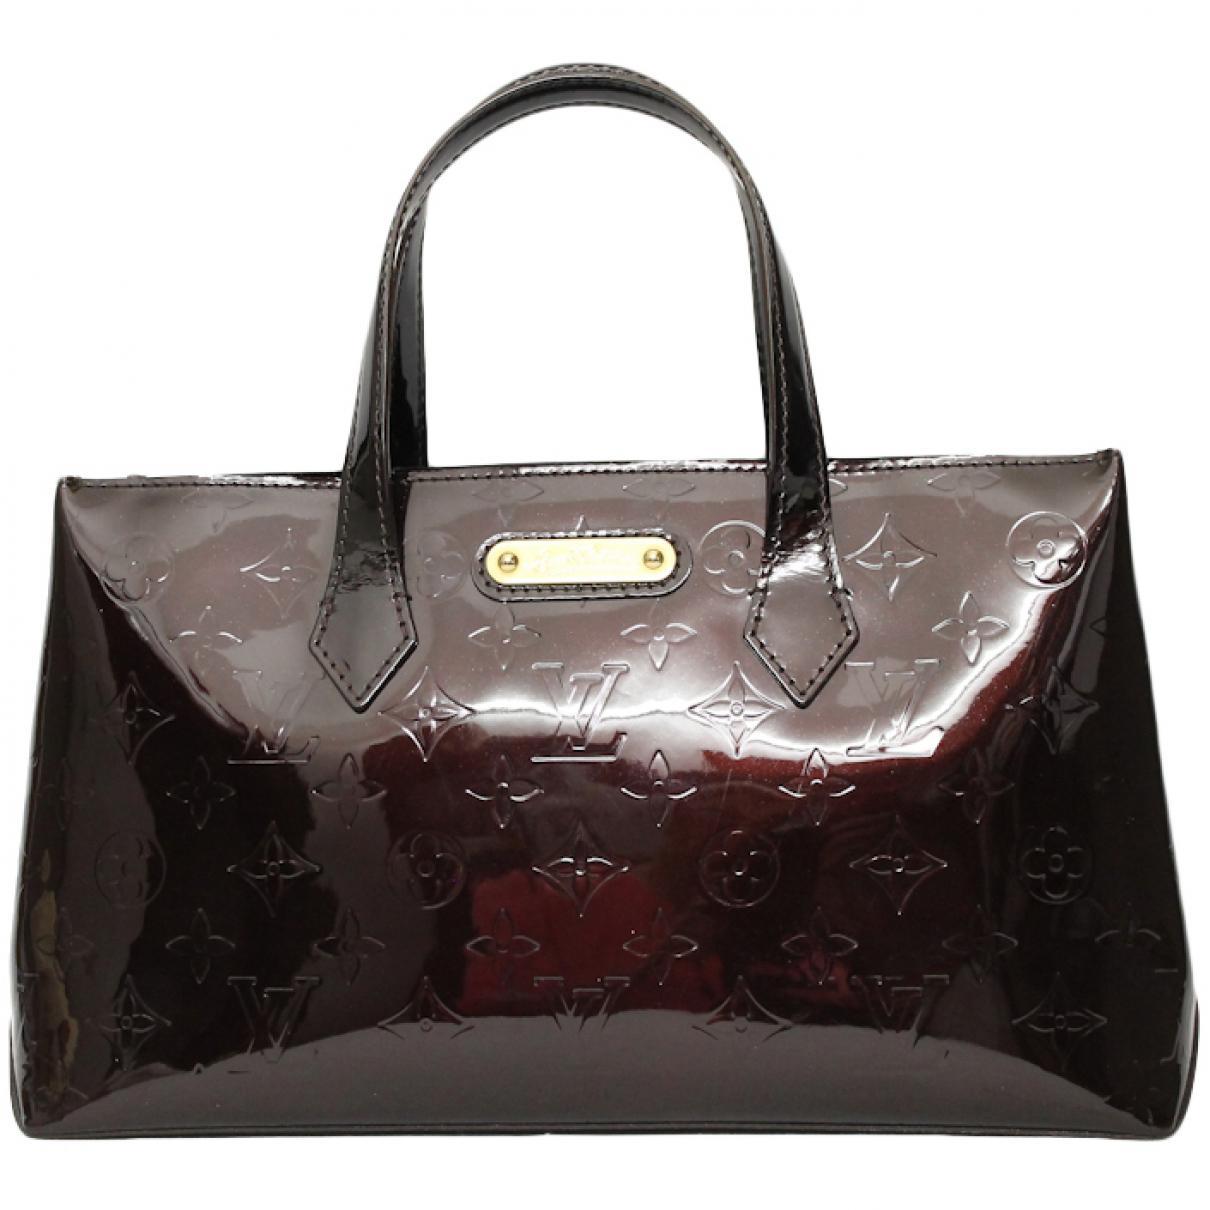 Louis Vuitton Women S Burgundy Patent Leather Handbag